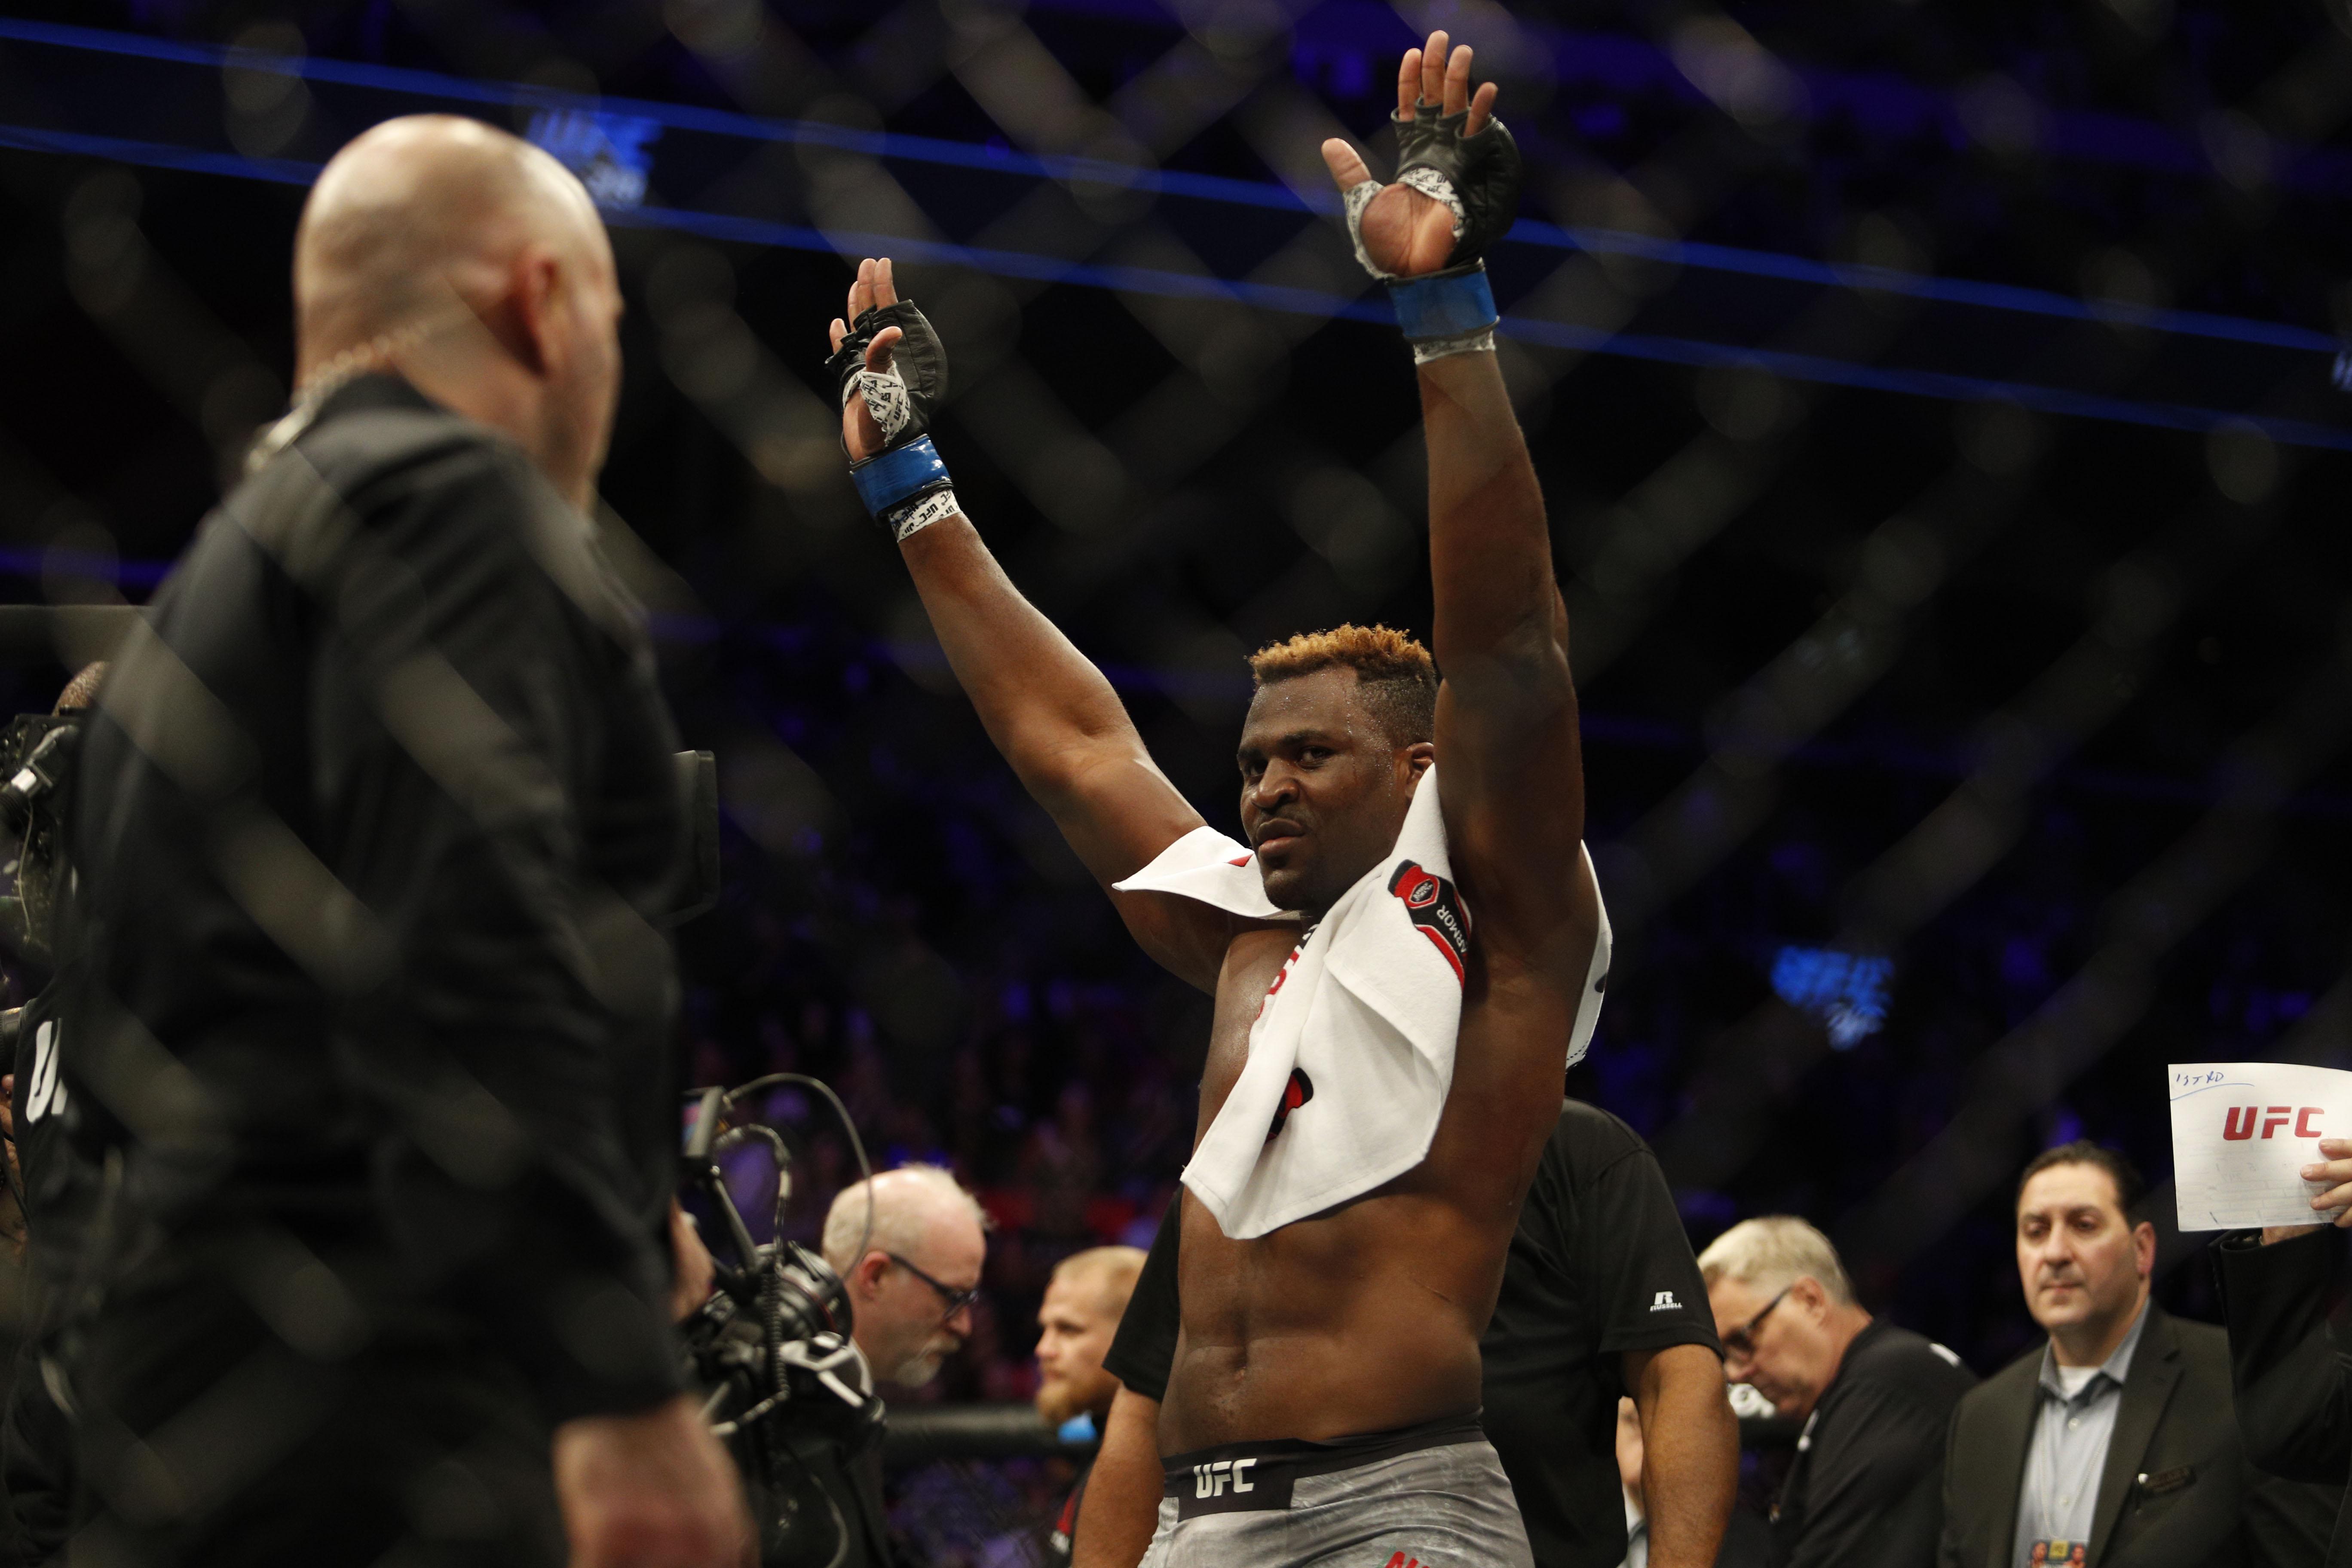 MMA: UFC 218-Overeem vs Ngannou